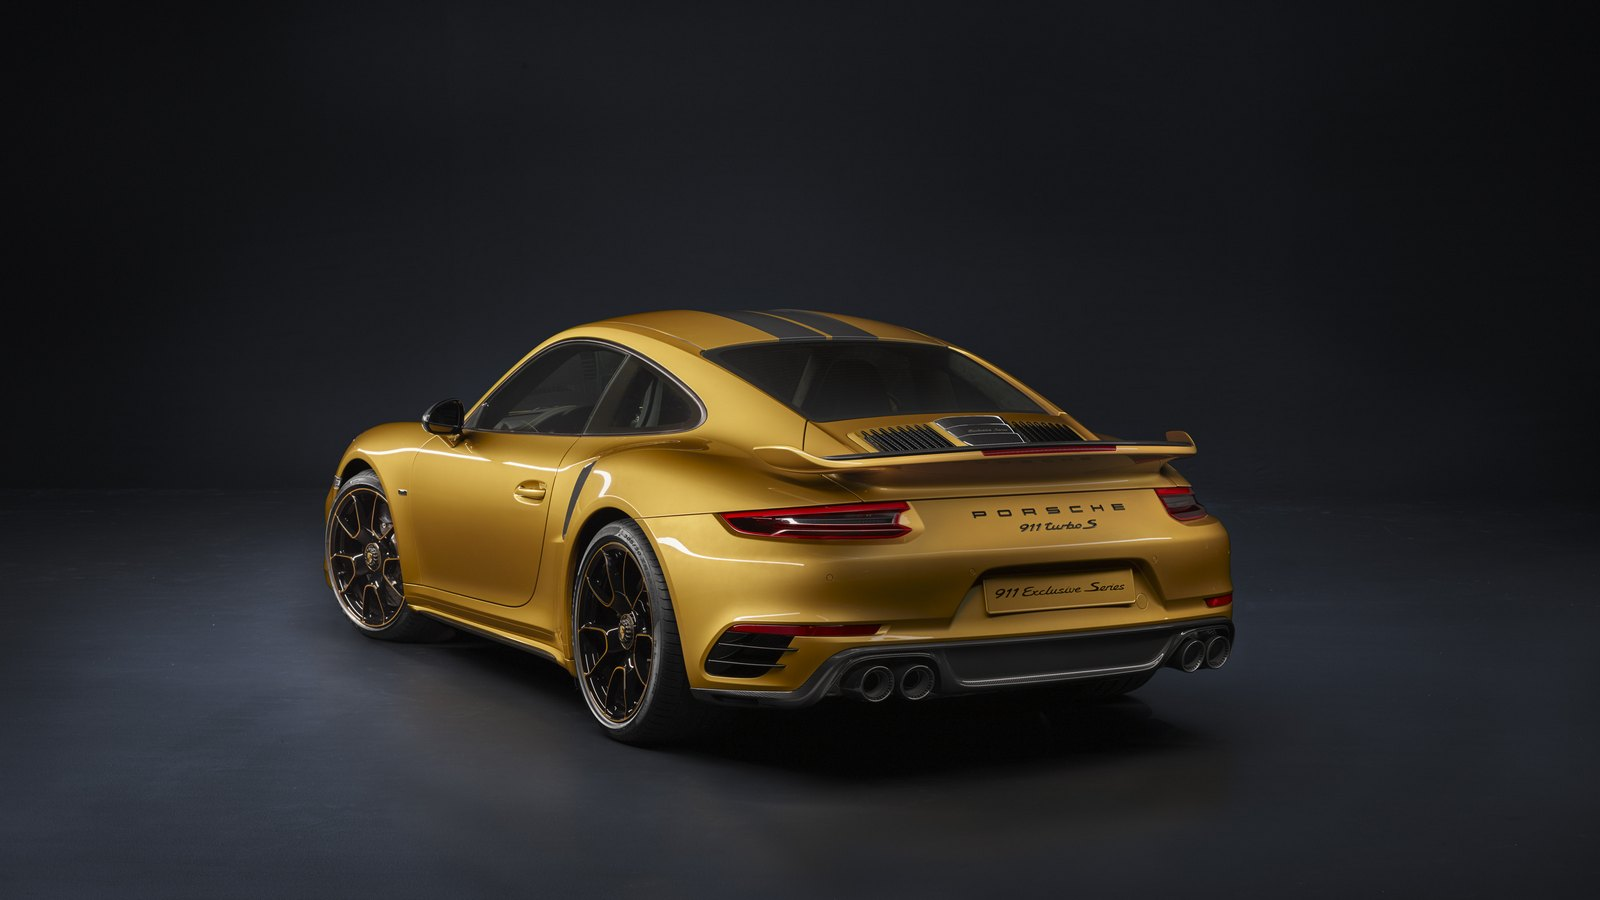 porsche_911_turbo_s_coupe_exclusive-series-4